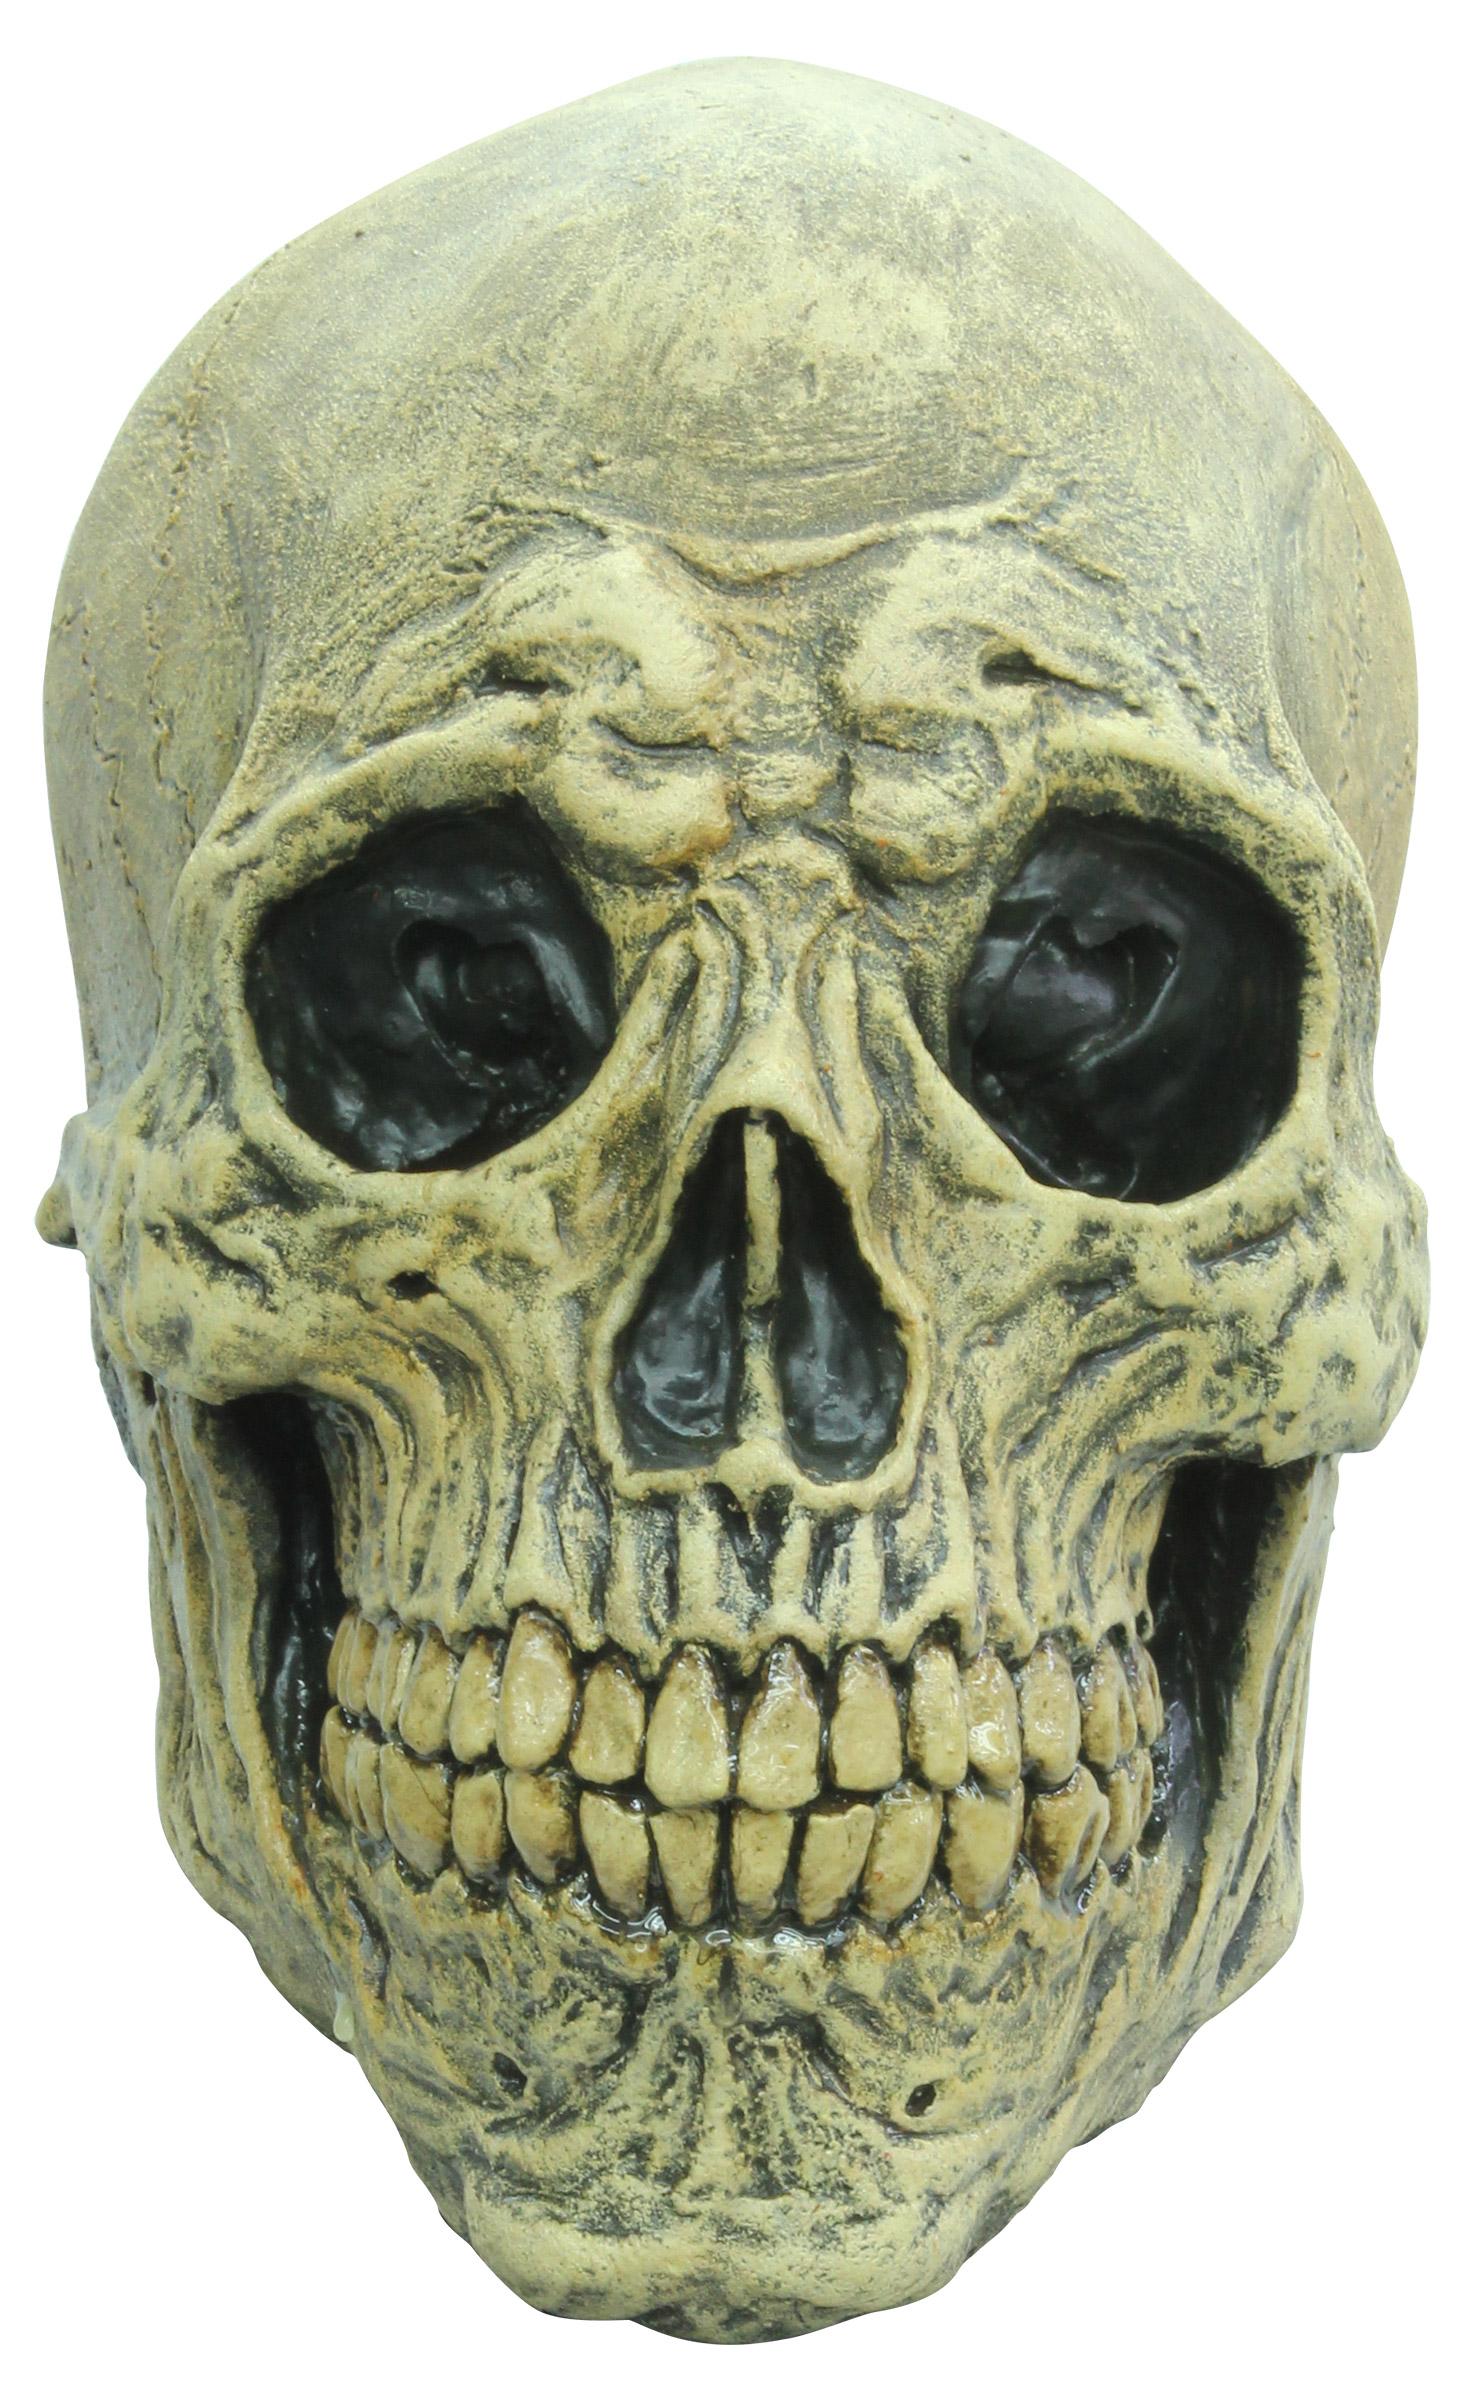 halloween gruselige skelett maske f r erwachsene masken. Black Bedroom Furniture Sets. Home Design Ideas